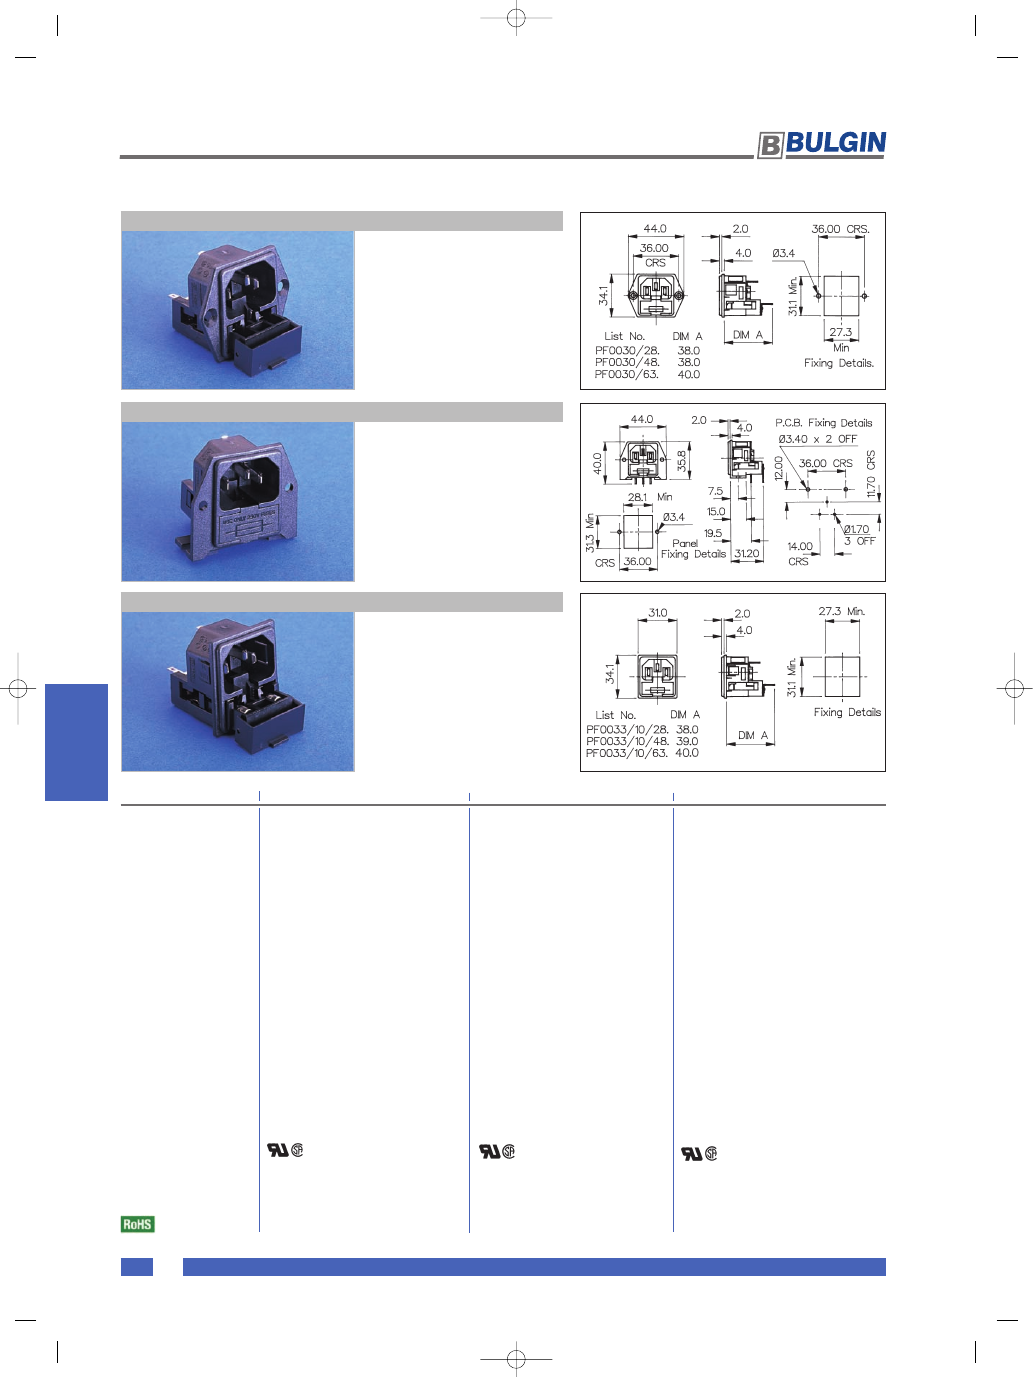 TWIN FUSE PF0030//63 By BULGIN IEC INLET